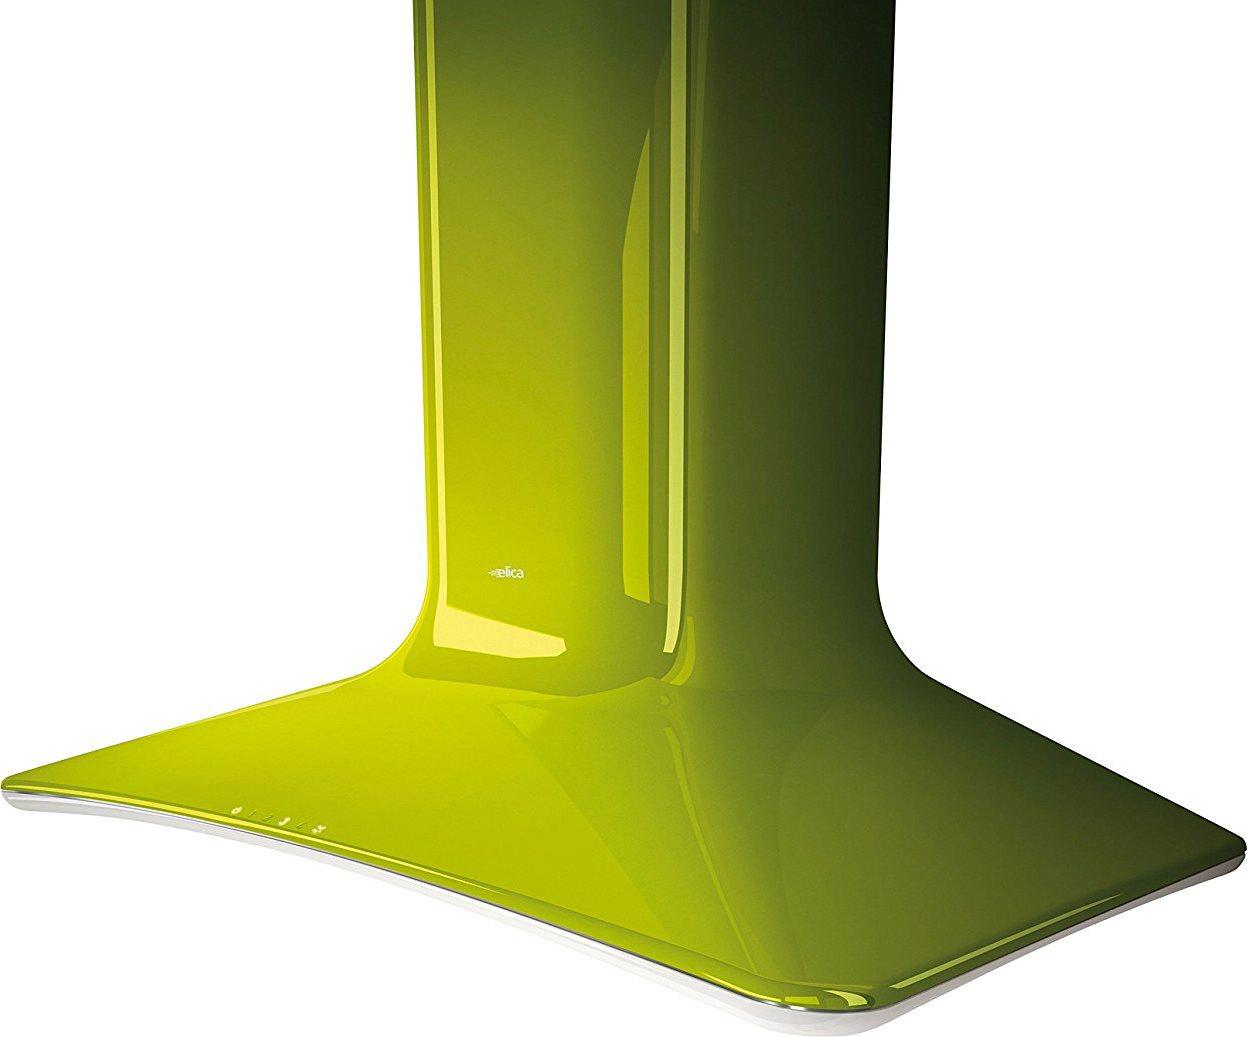 Elica cappa cucina filtrante parete 90 cm x 47 cm verde sweet green f 85 ebay - Scarico fumi cappa cucina a parete ...